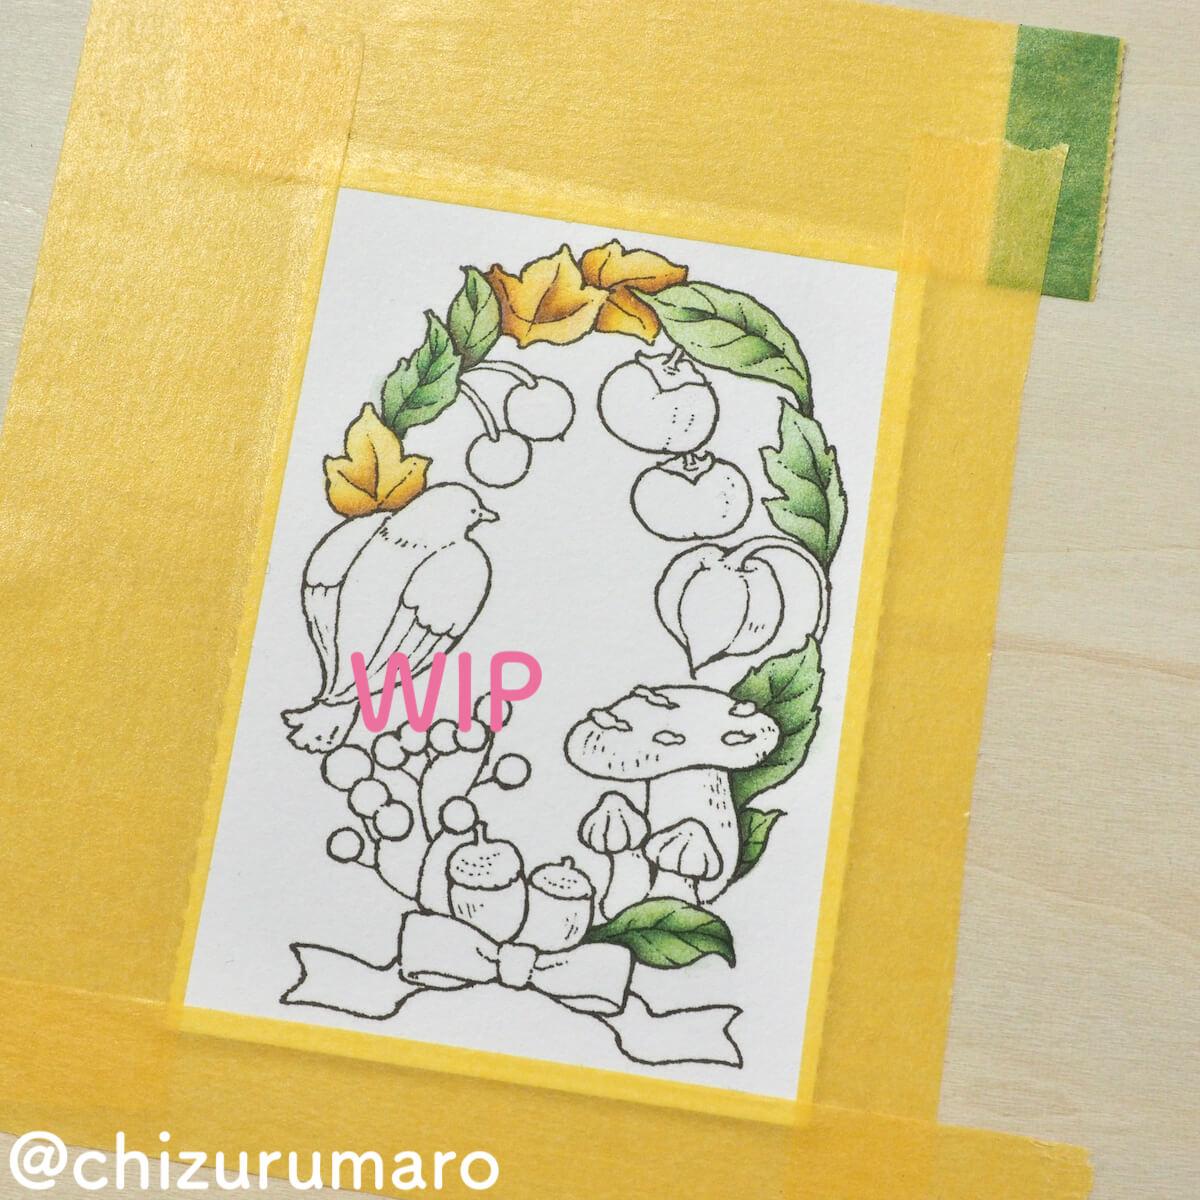 f:id:chizurumaro:20200217145814j:plain